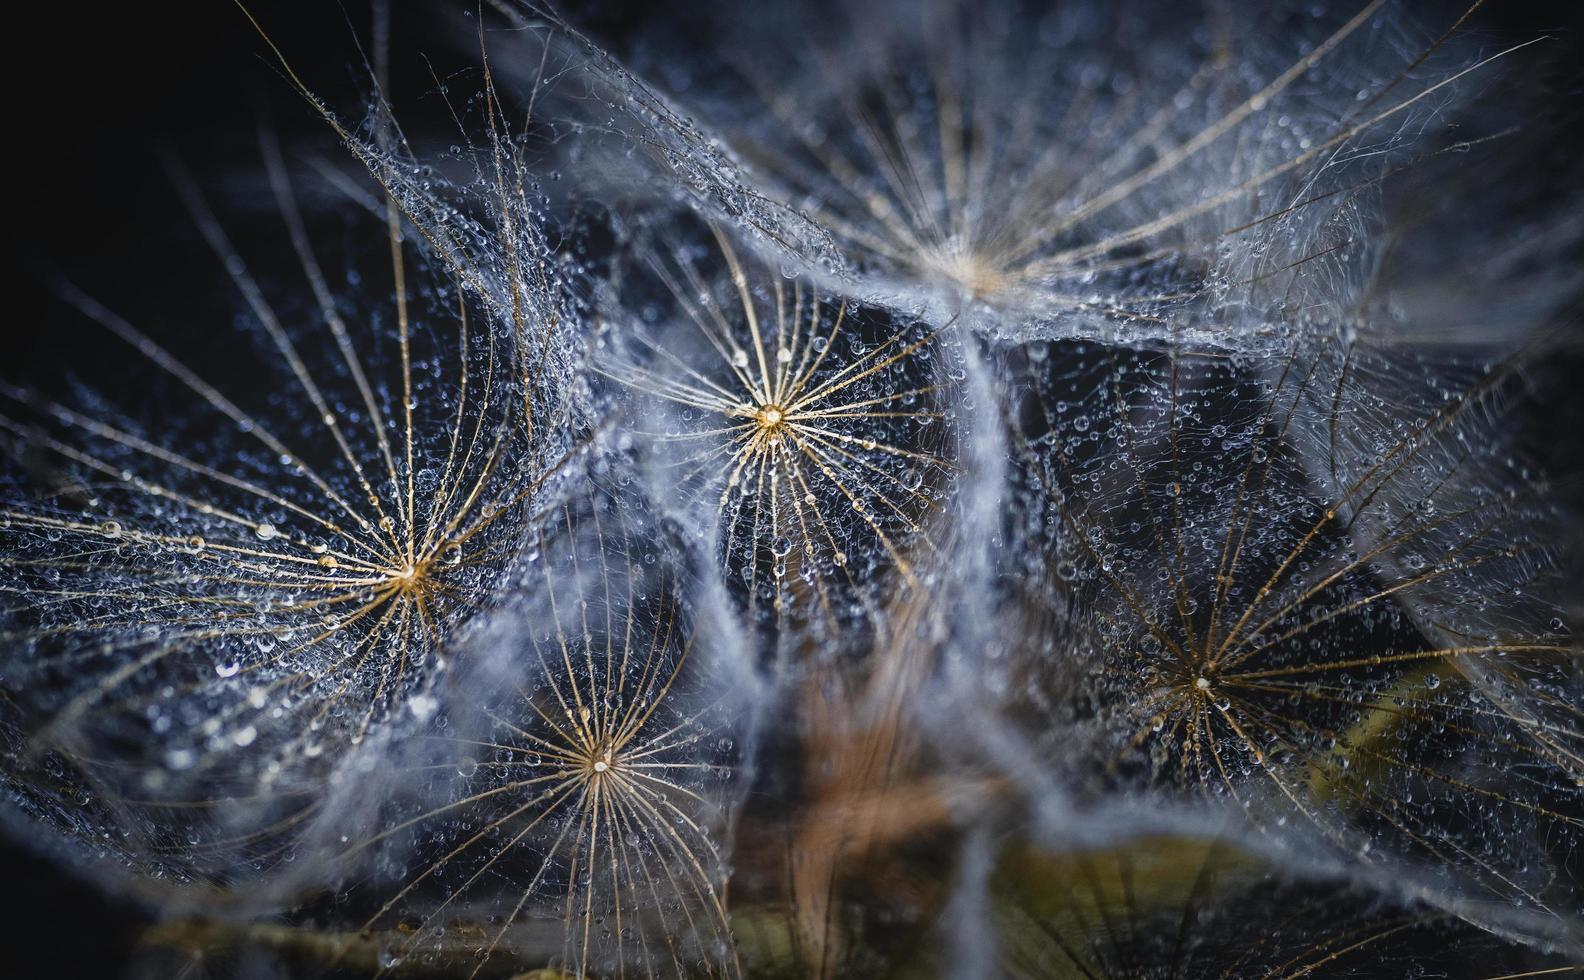 White dandelion seed head photo